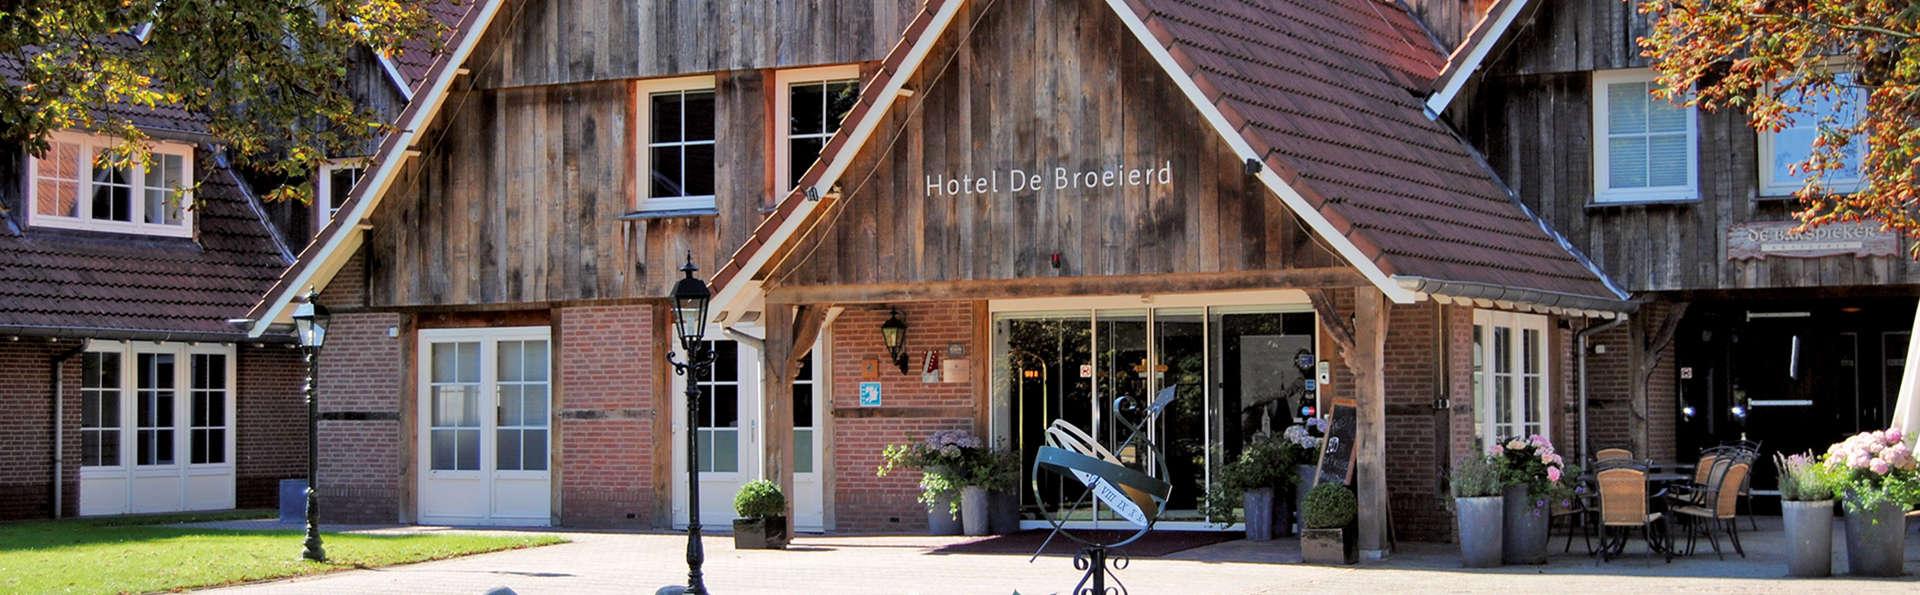 Fletcher Hotel-Restaurant De Broeierd-Enschede (Former Hampshire Hotel De Broeierd-Enschede) - Edit_Front3.jpg